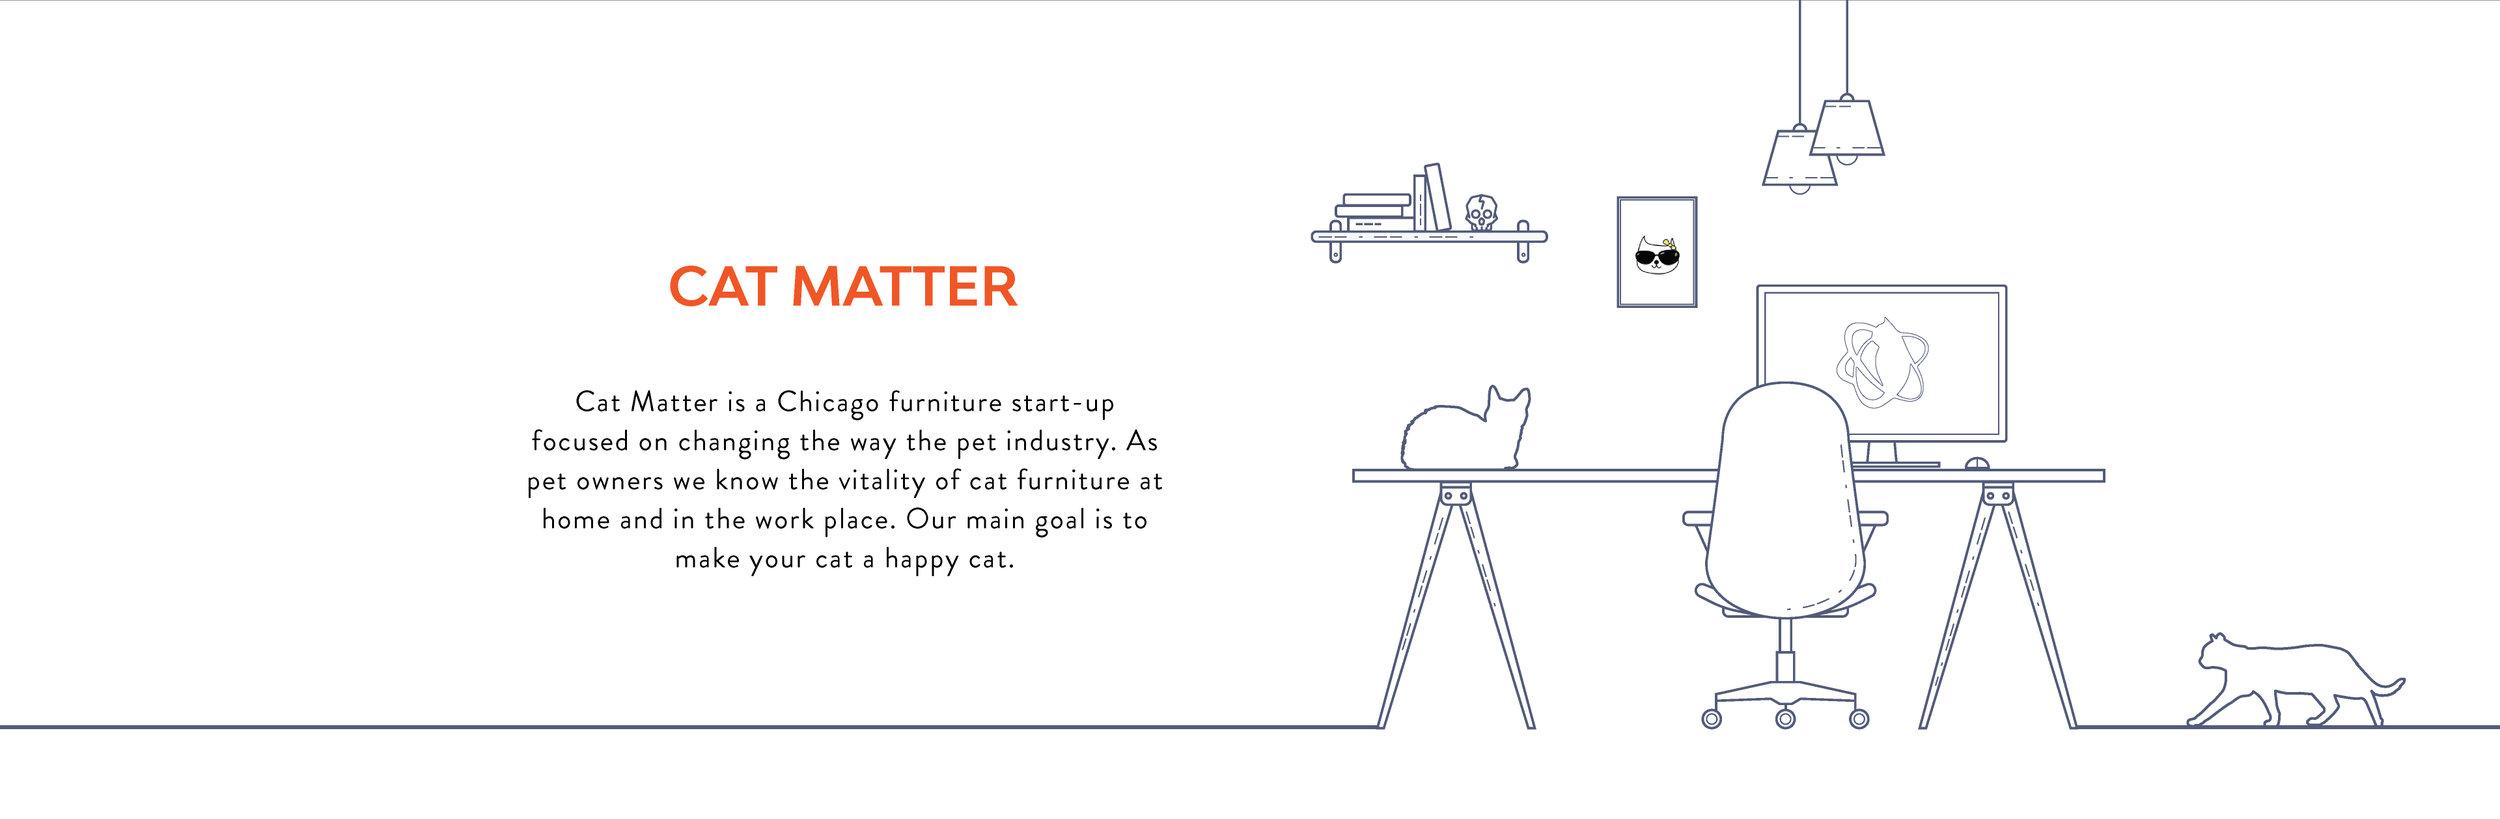 CatMatter-intro.jpg